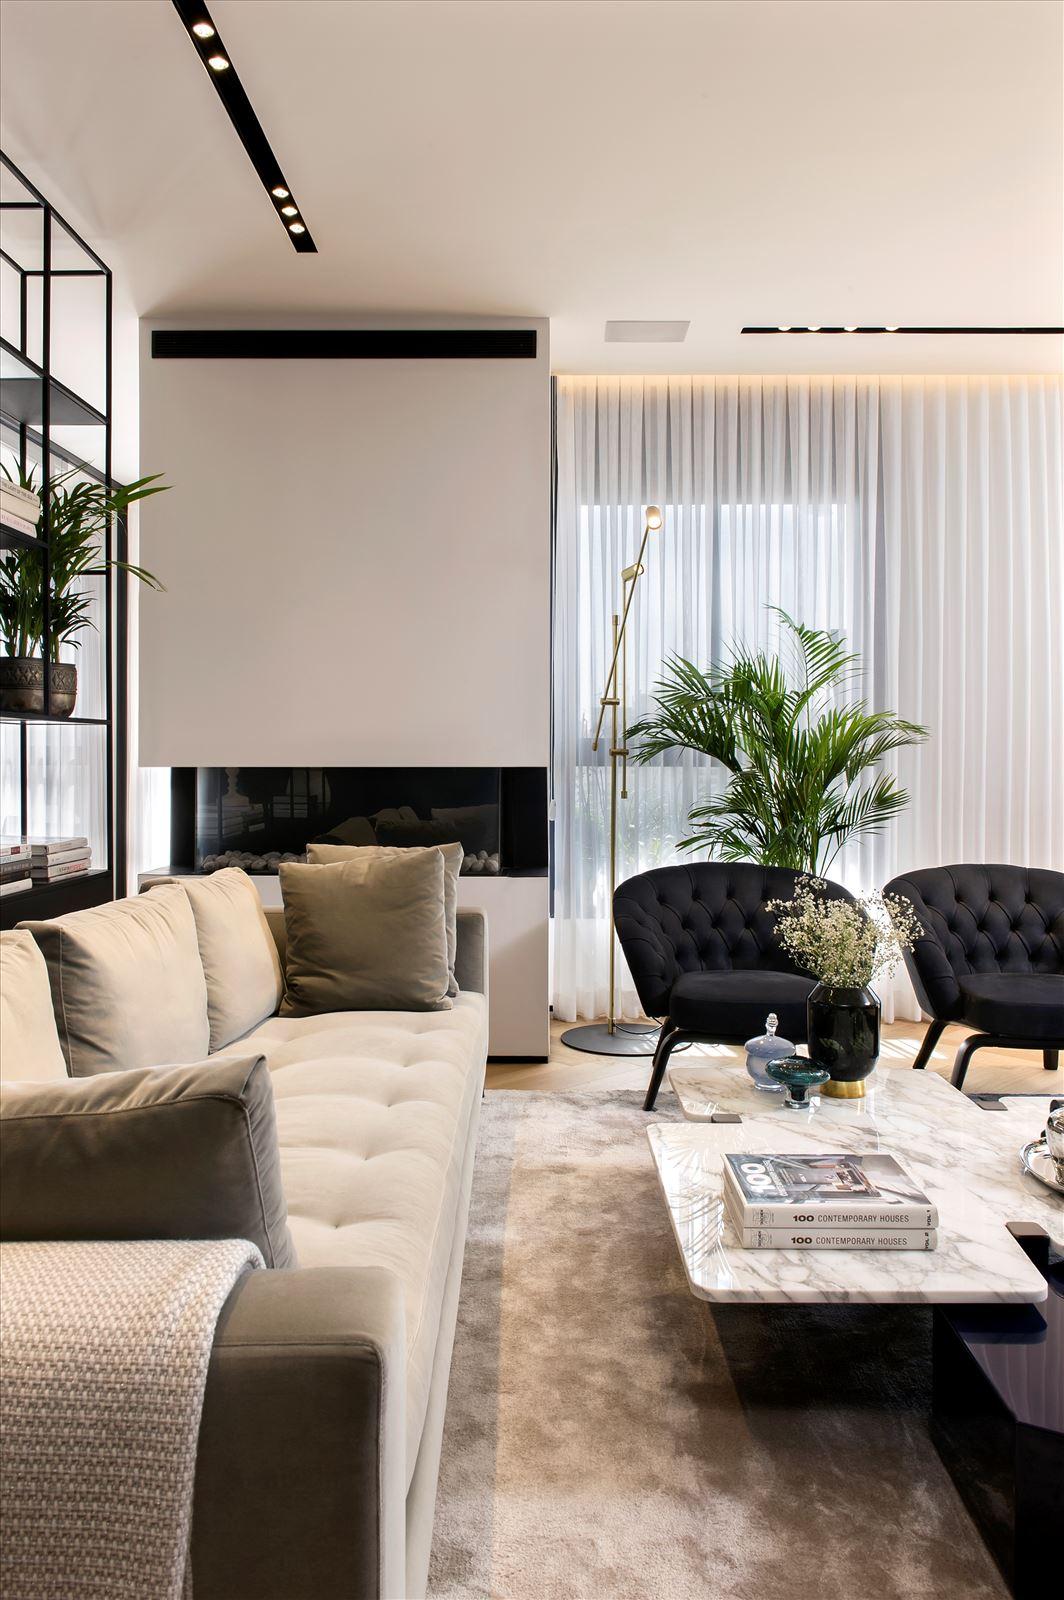 Penthouse - Petah Tikva גופי תאורה מעל ספות הסלון בתכנון דורי קמחי